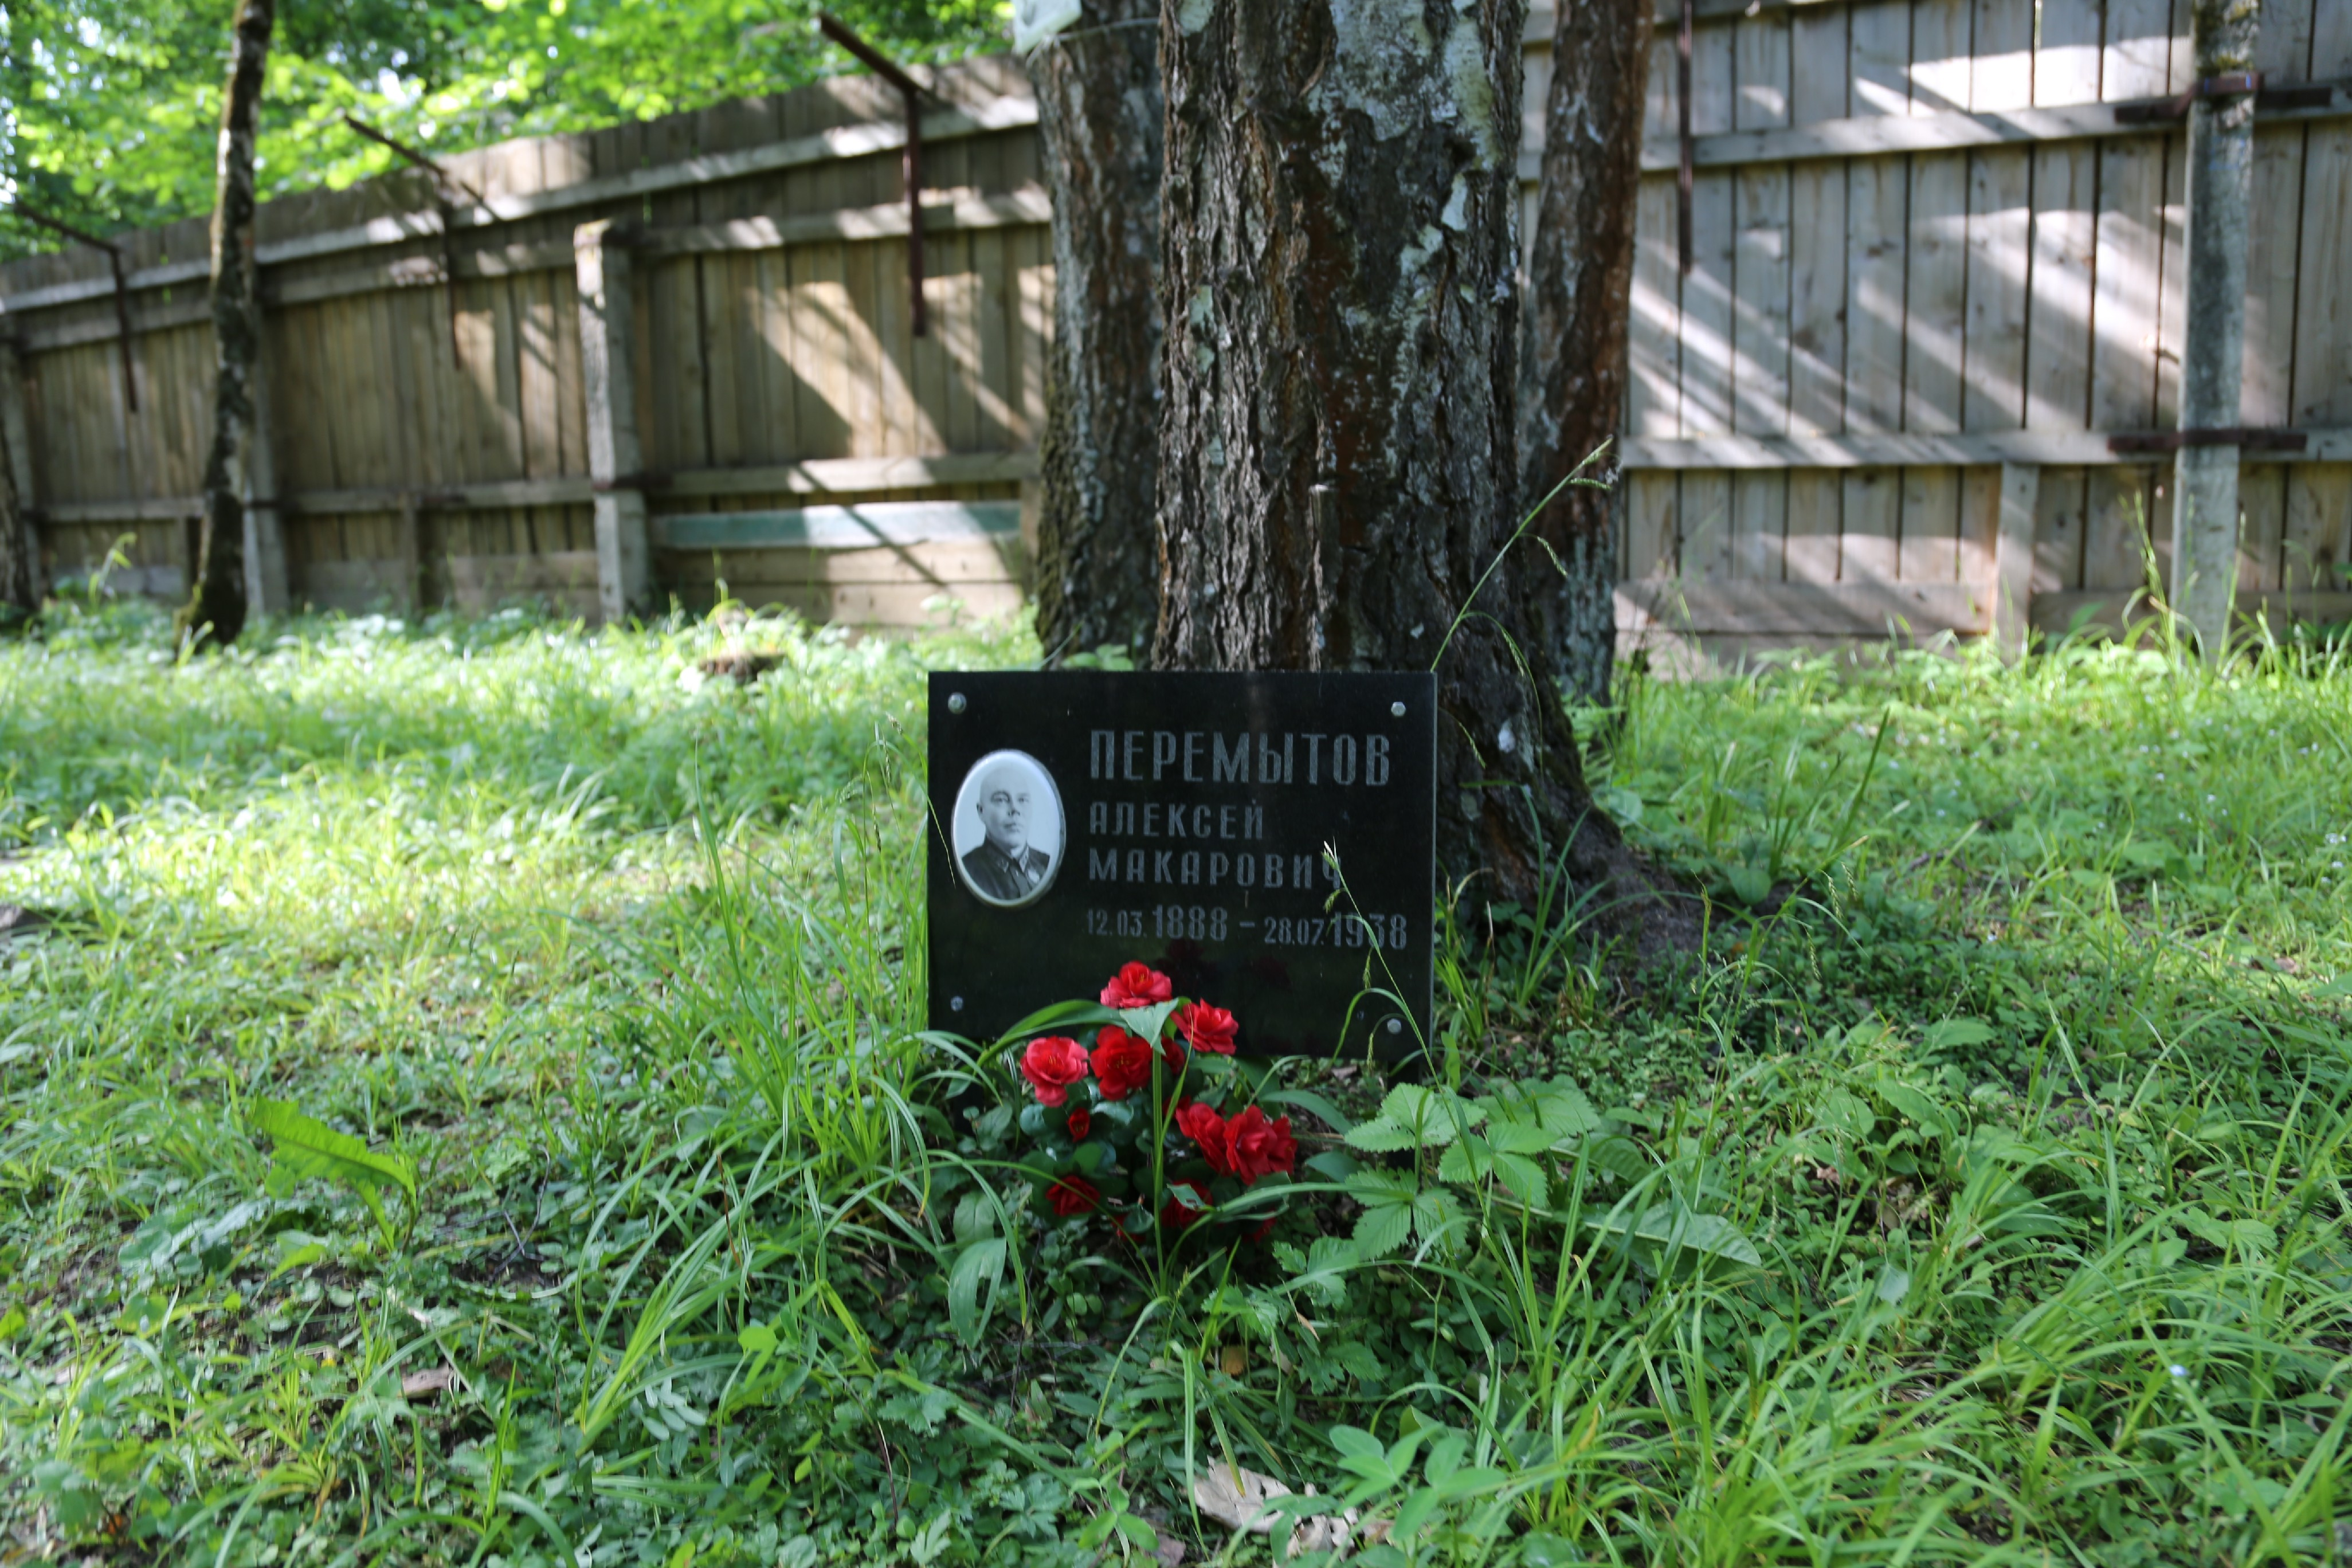 Символическое надгробие А.М. Перемытова. Фото 07.06.2018